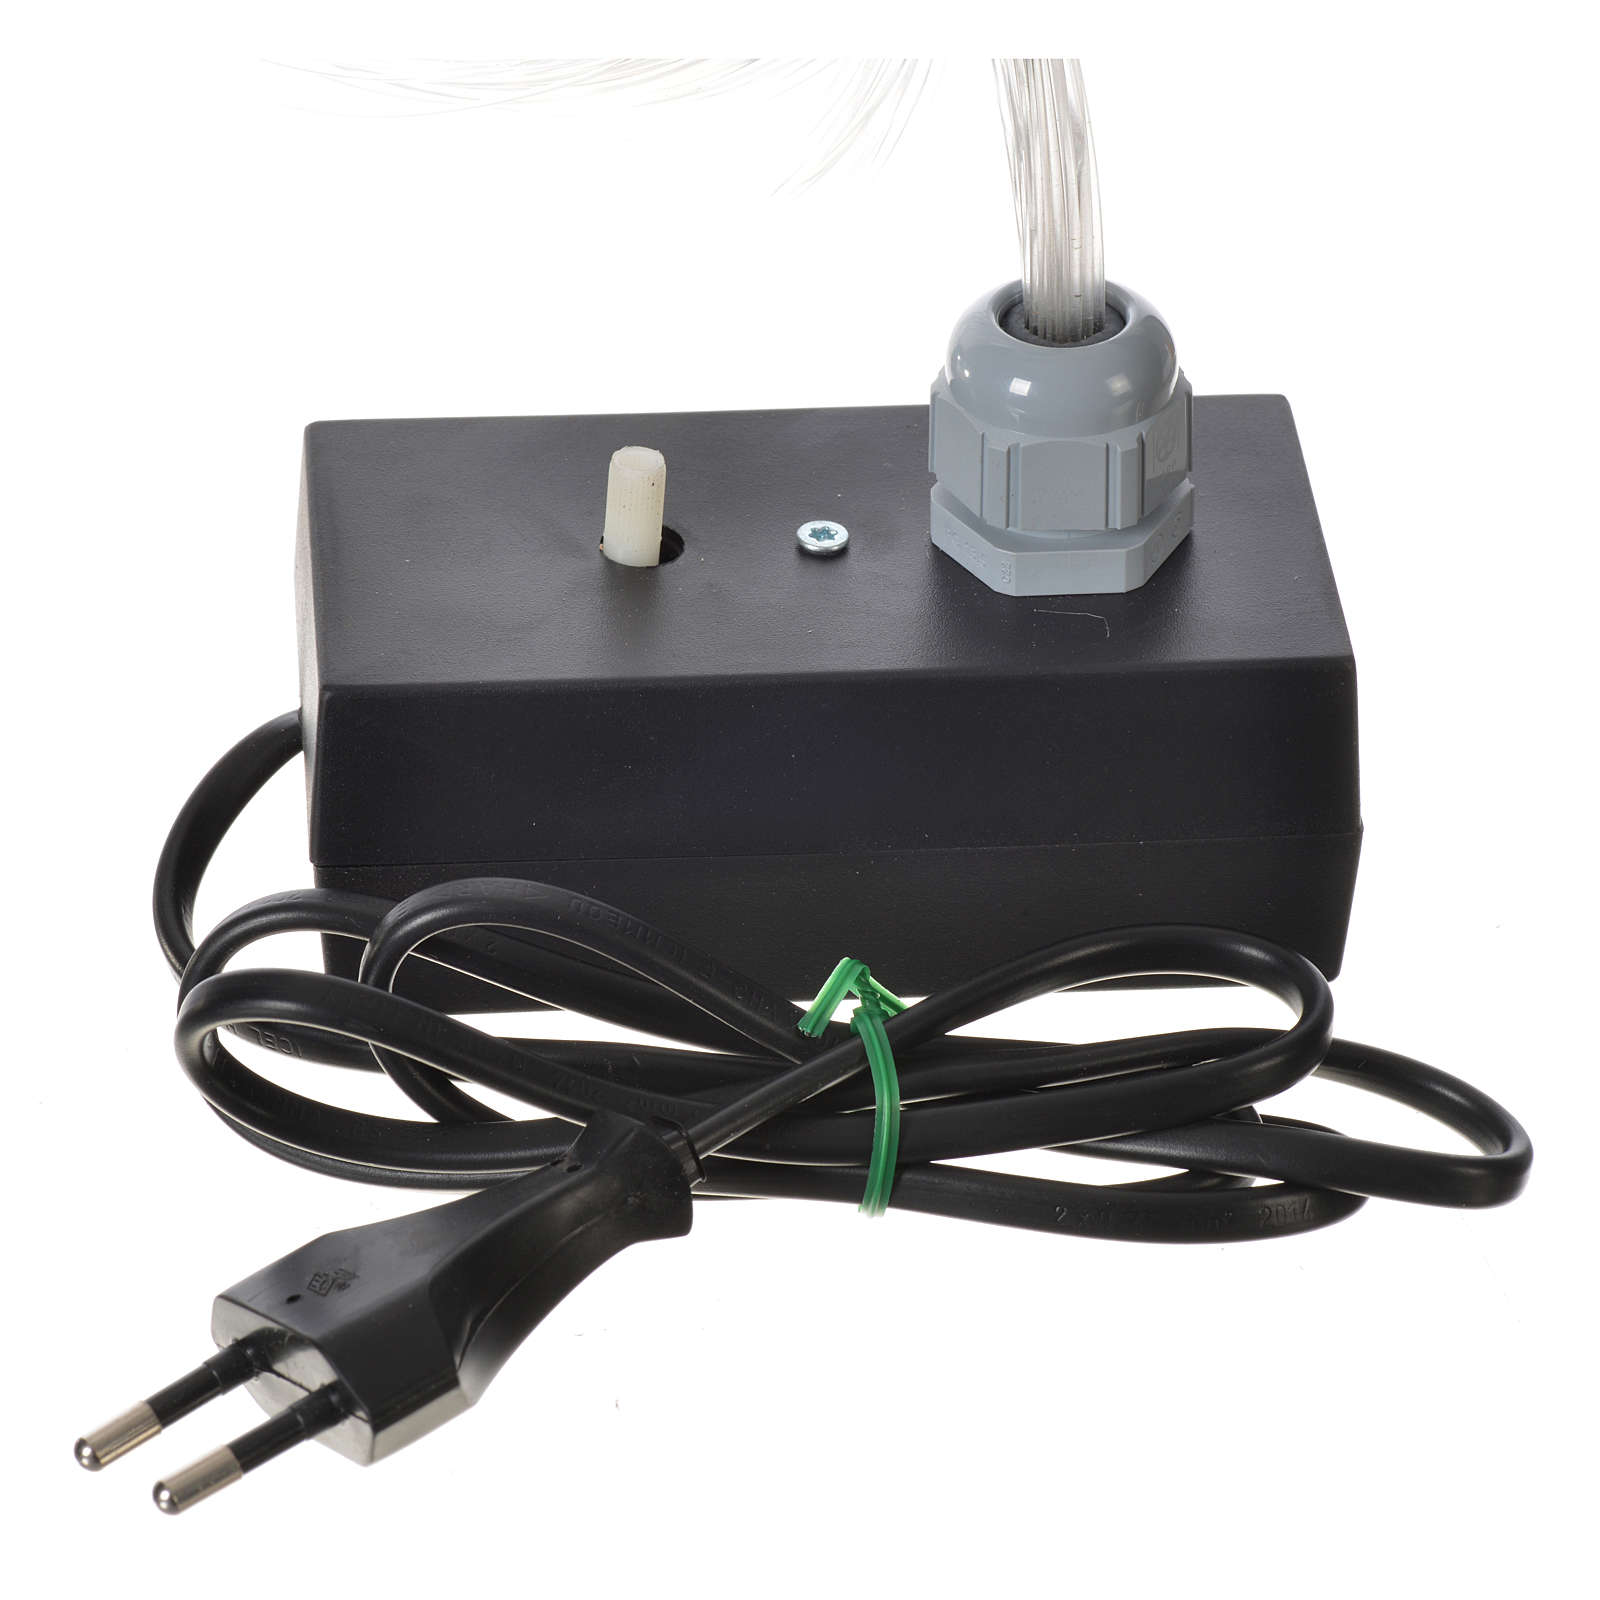 Illuminatore led dissolvenza tremolio 45 fili fibra ottica 4